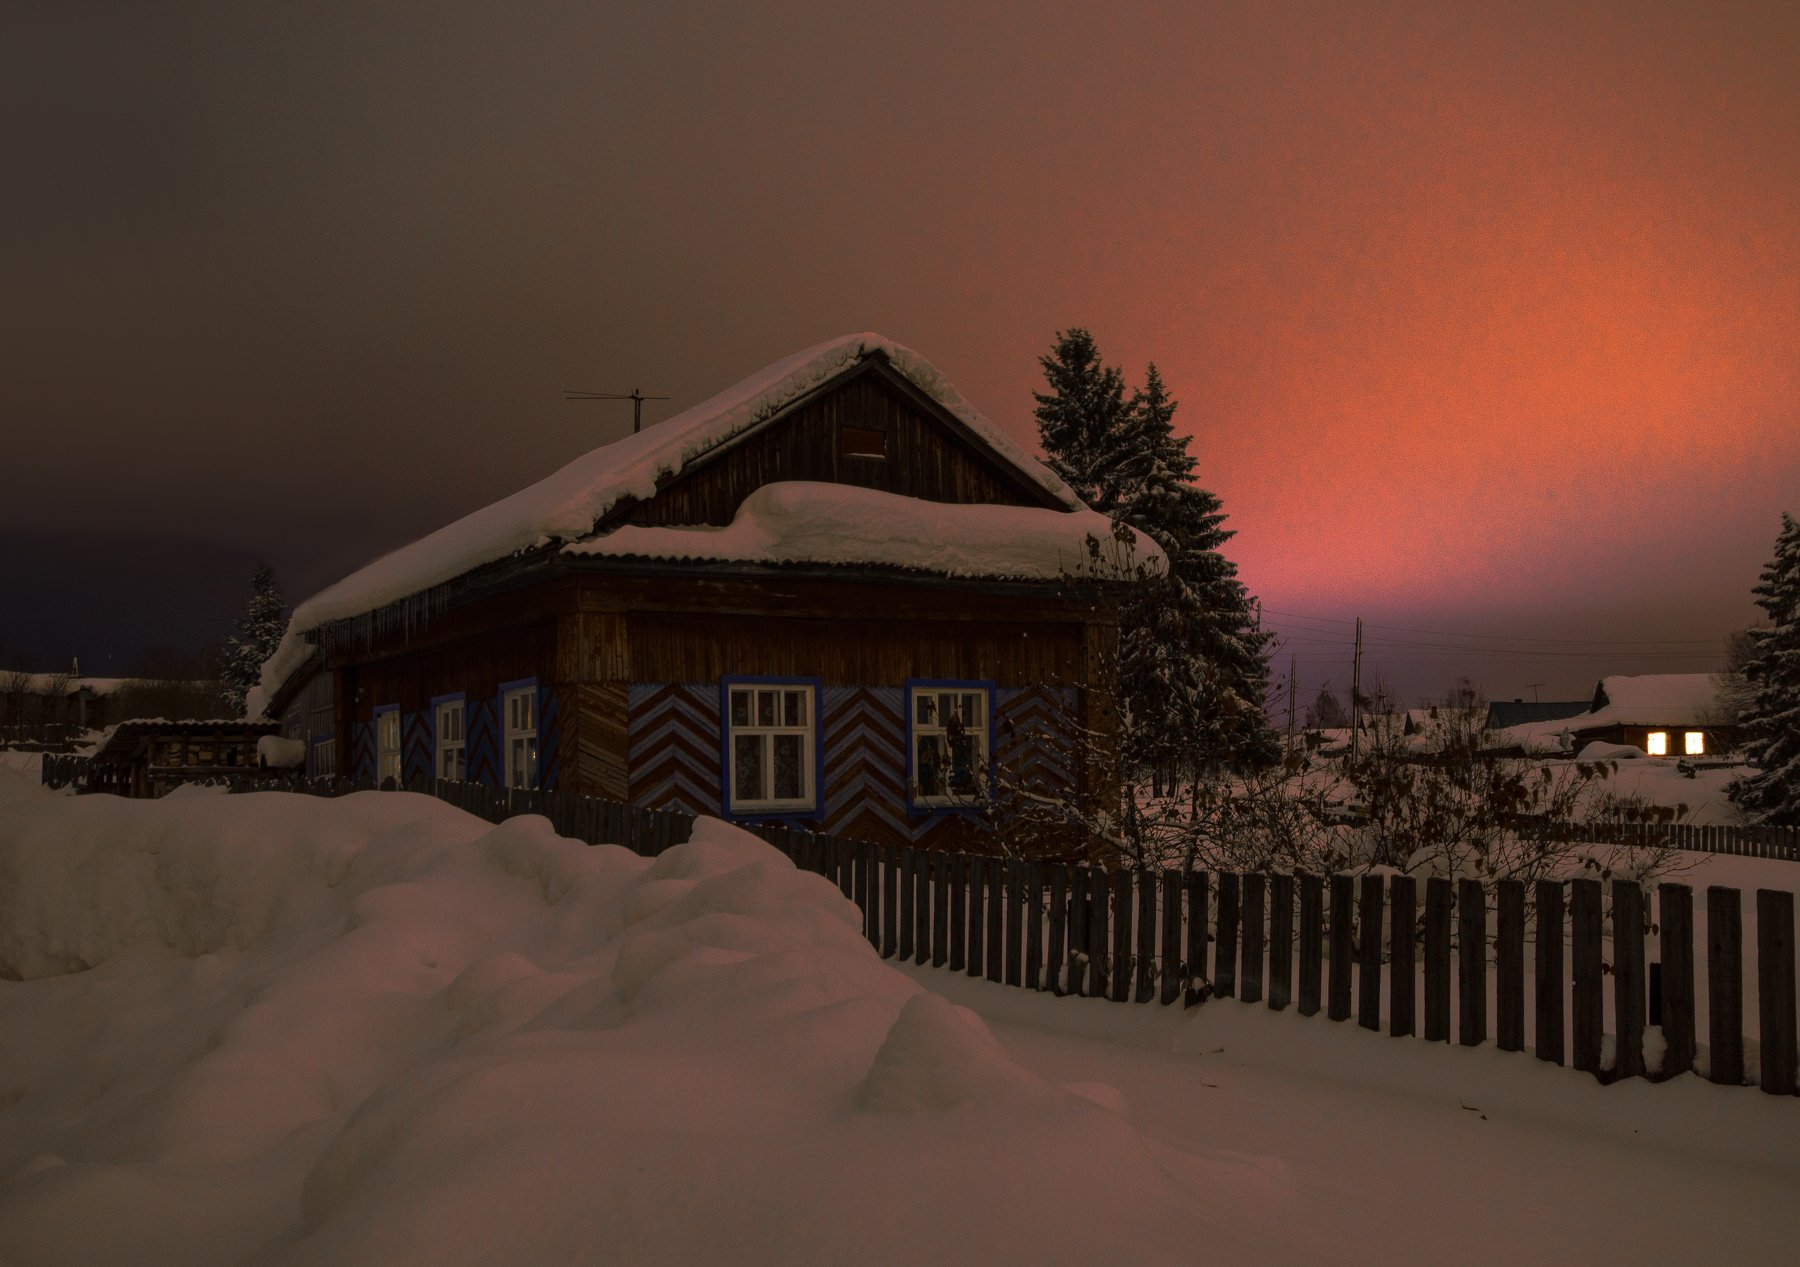 прогулка,сон,небо,зима, Карепанов Евгений